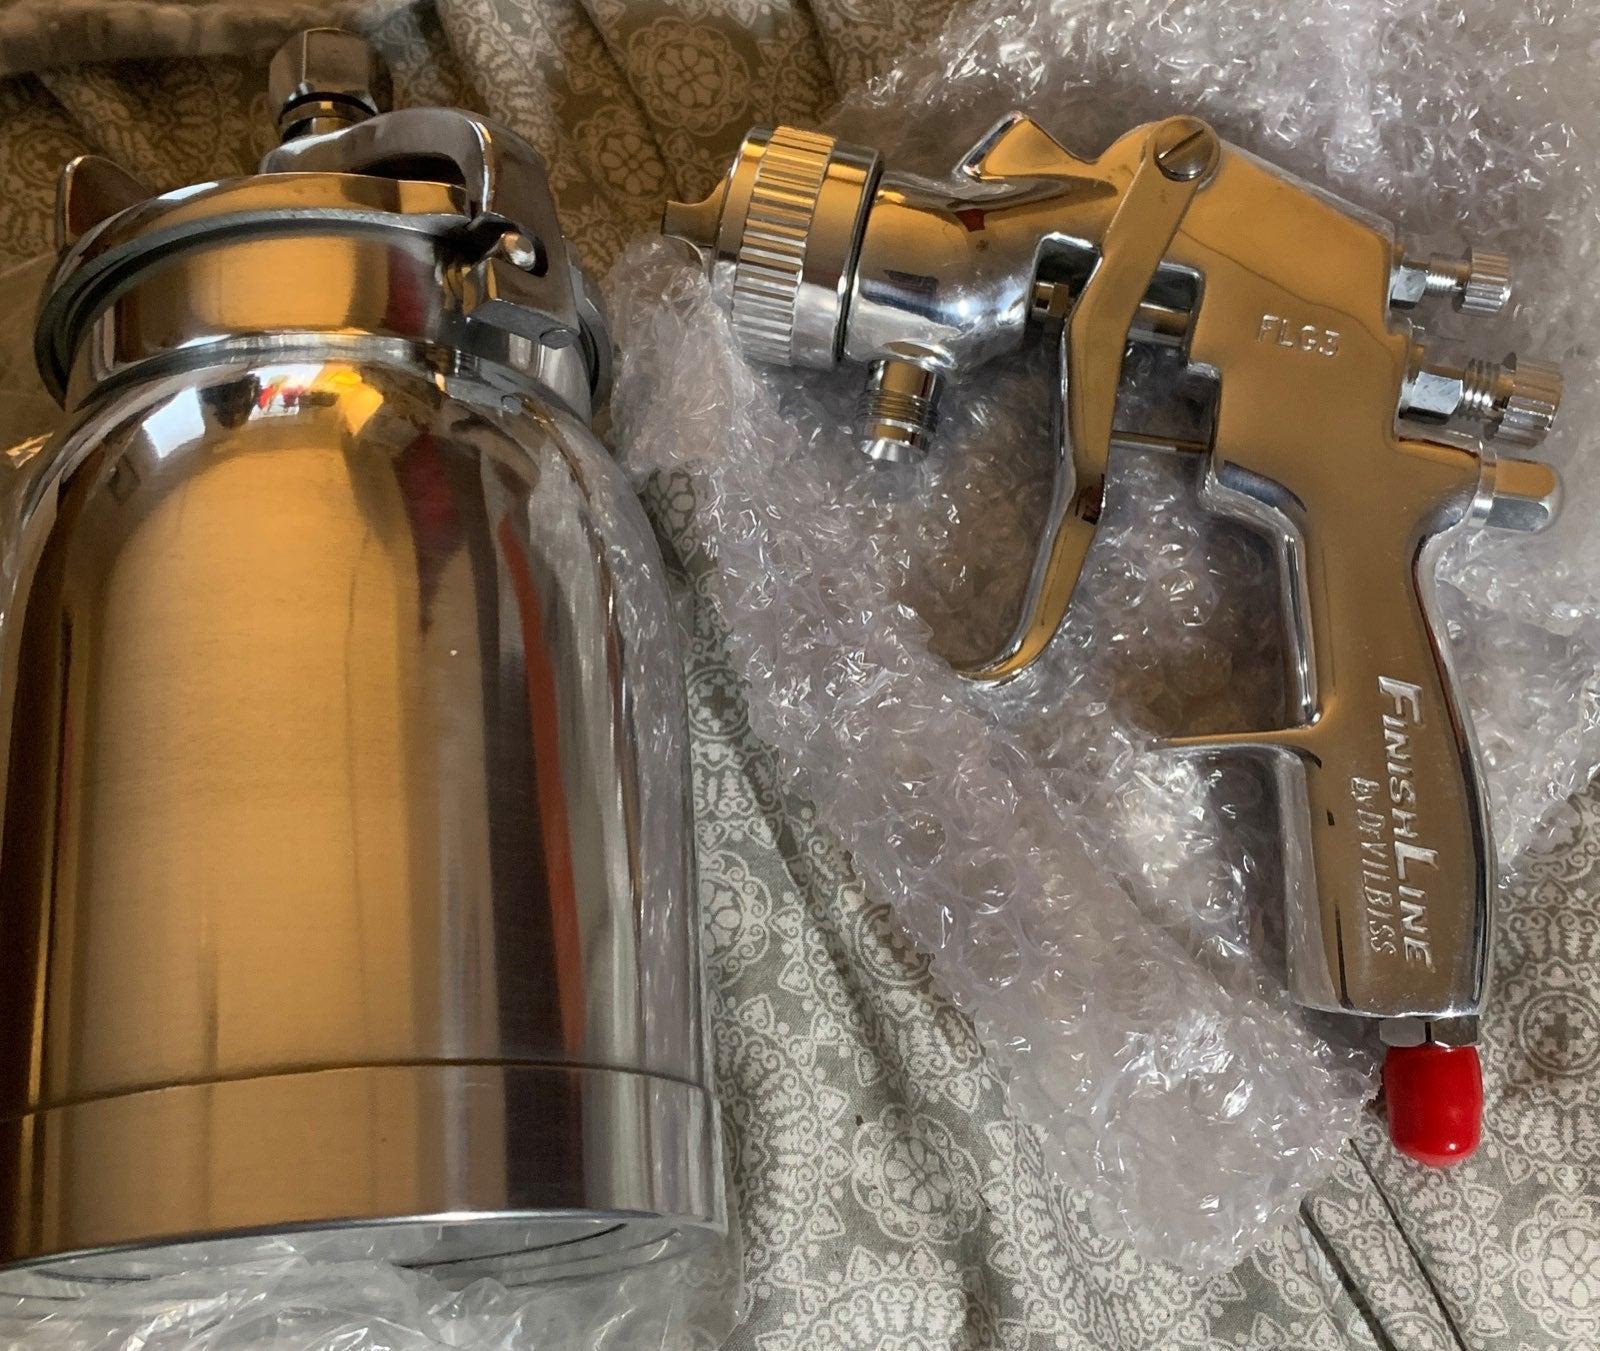 DeVilbiss FLG3 suction feed spray gun